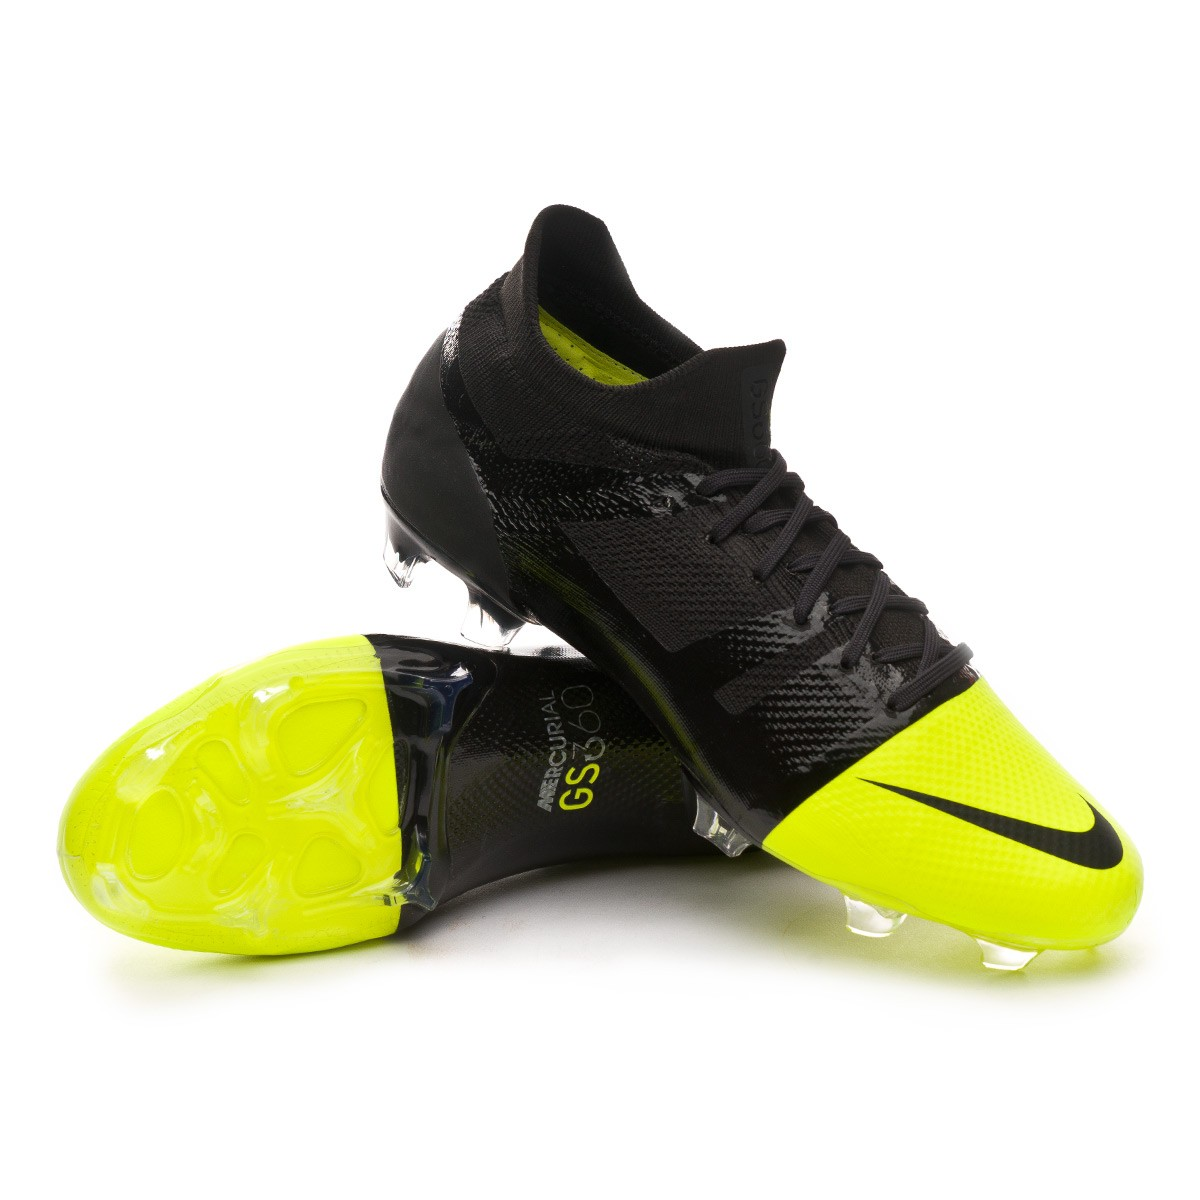 brand new 1638c 8d139 Scarpe Nike Mercurial GreenSpeed 360 FG Black-Metallic silver-Volt -  Negozio di calcio Fútbol Emotion